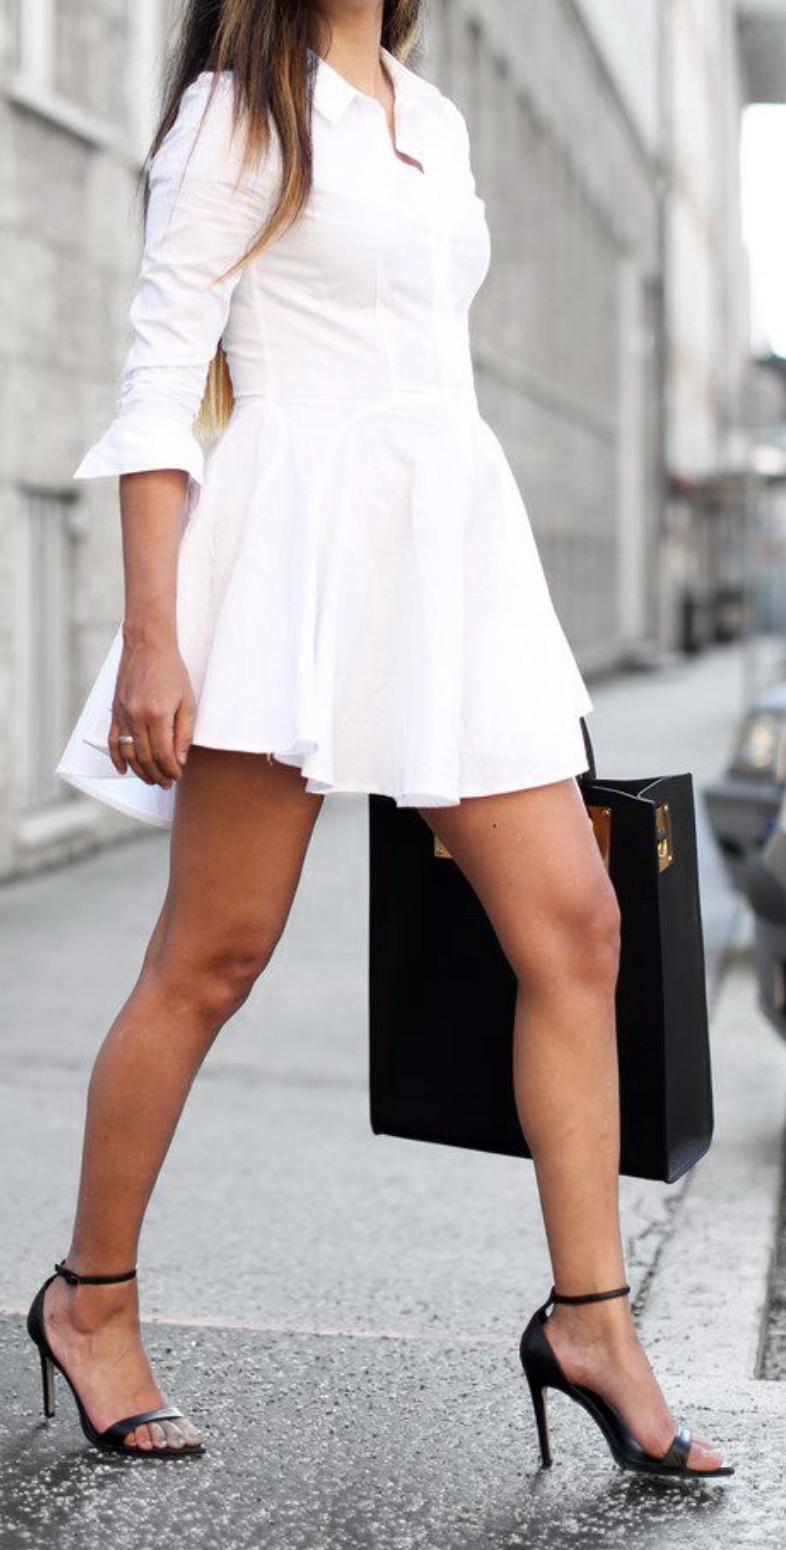 http://fashion-landscape.com/wp-content/uploads/2014/10/800.jpg